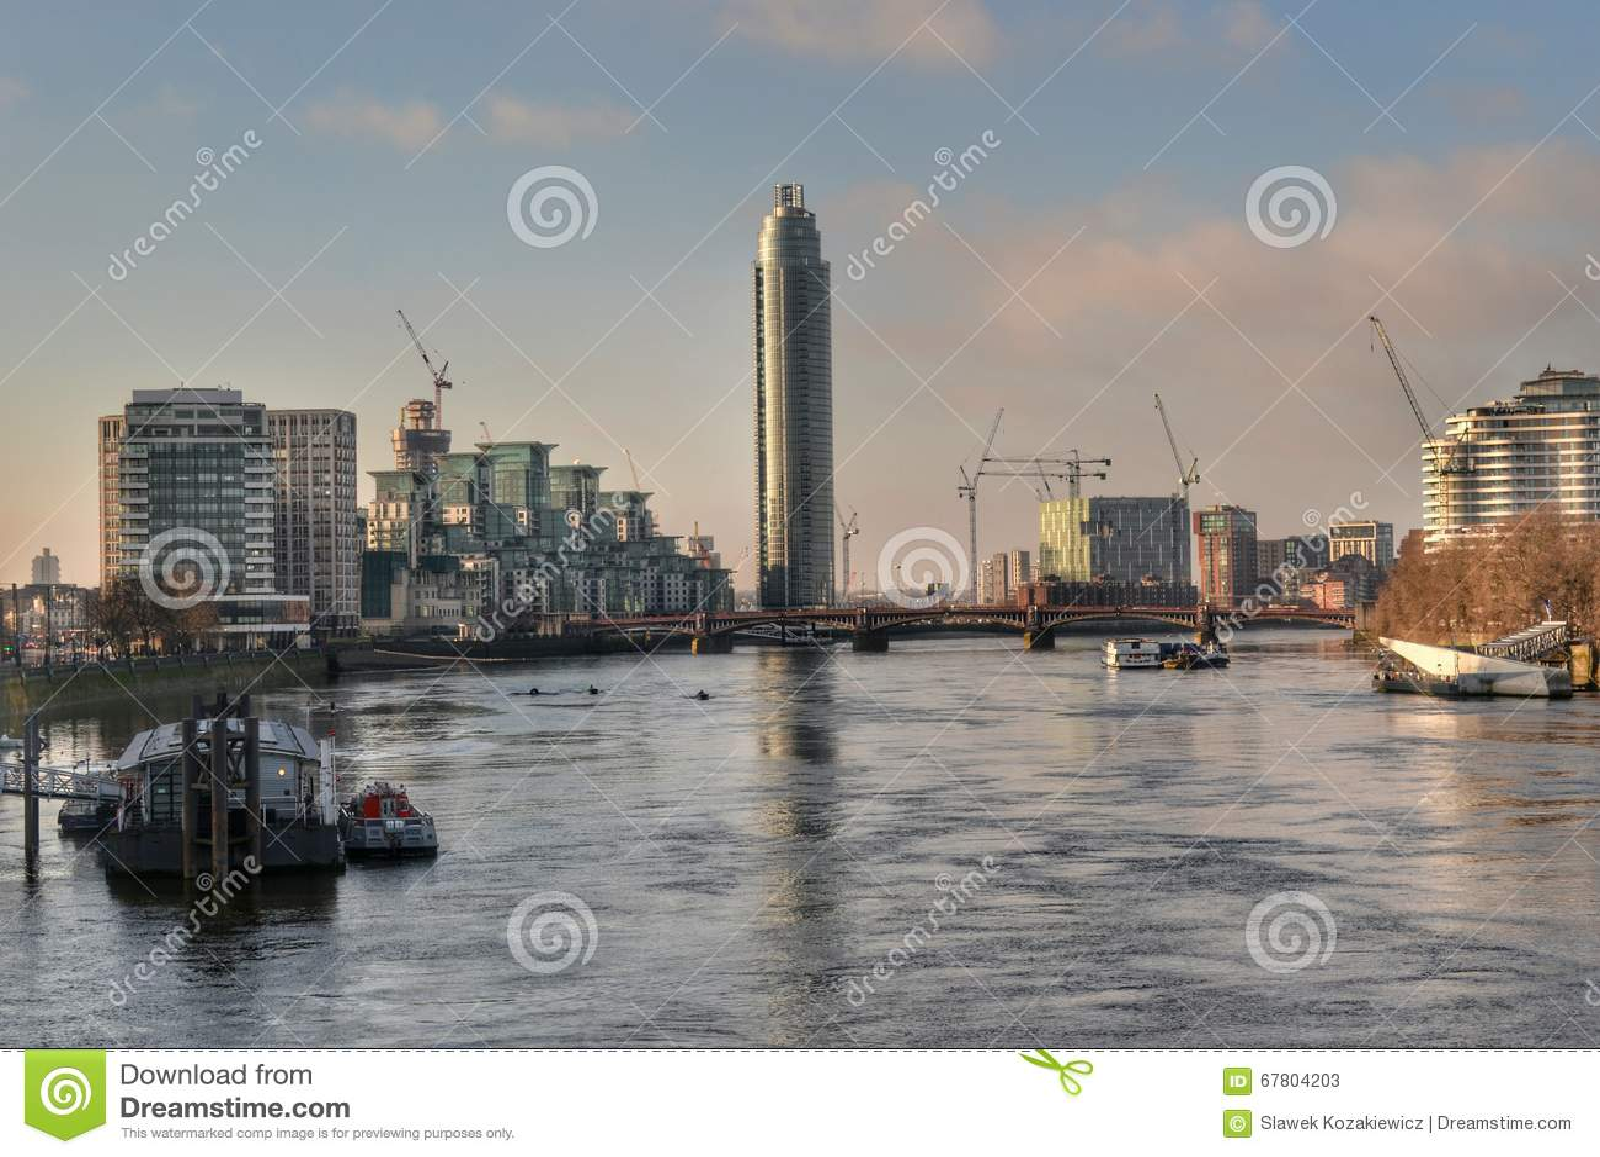 Pont Londres De La Tamise Vauxhall Photo Stock Editorial